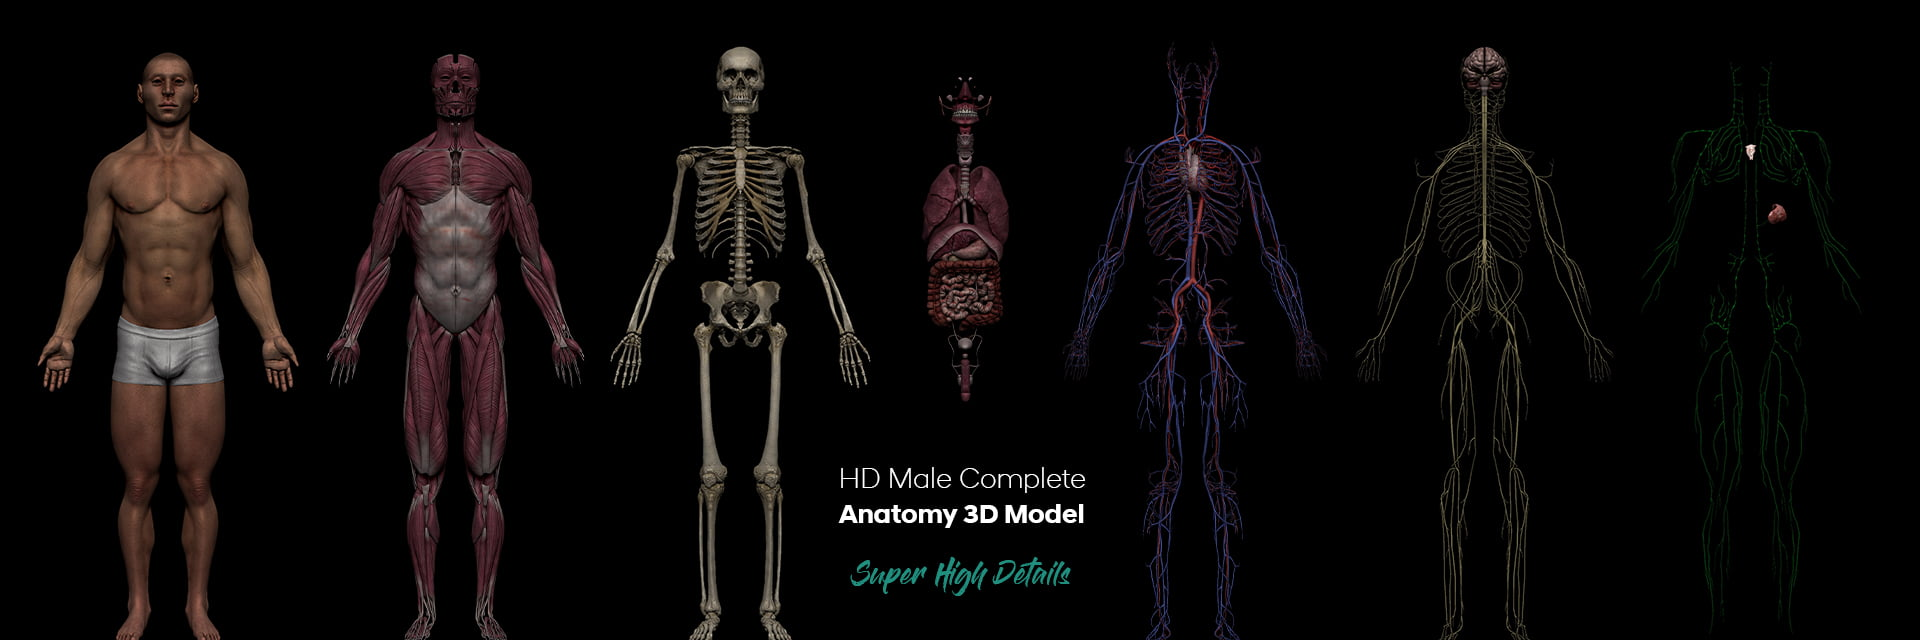 3D Anatomy Models